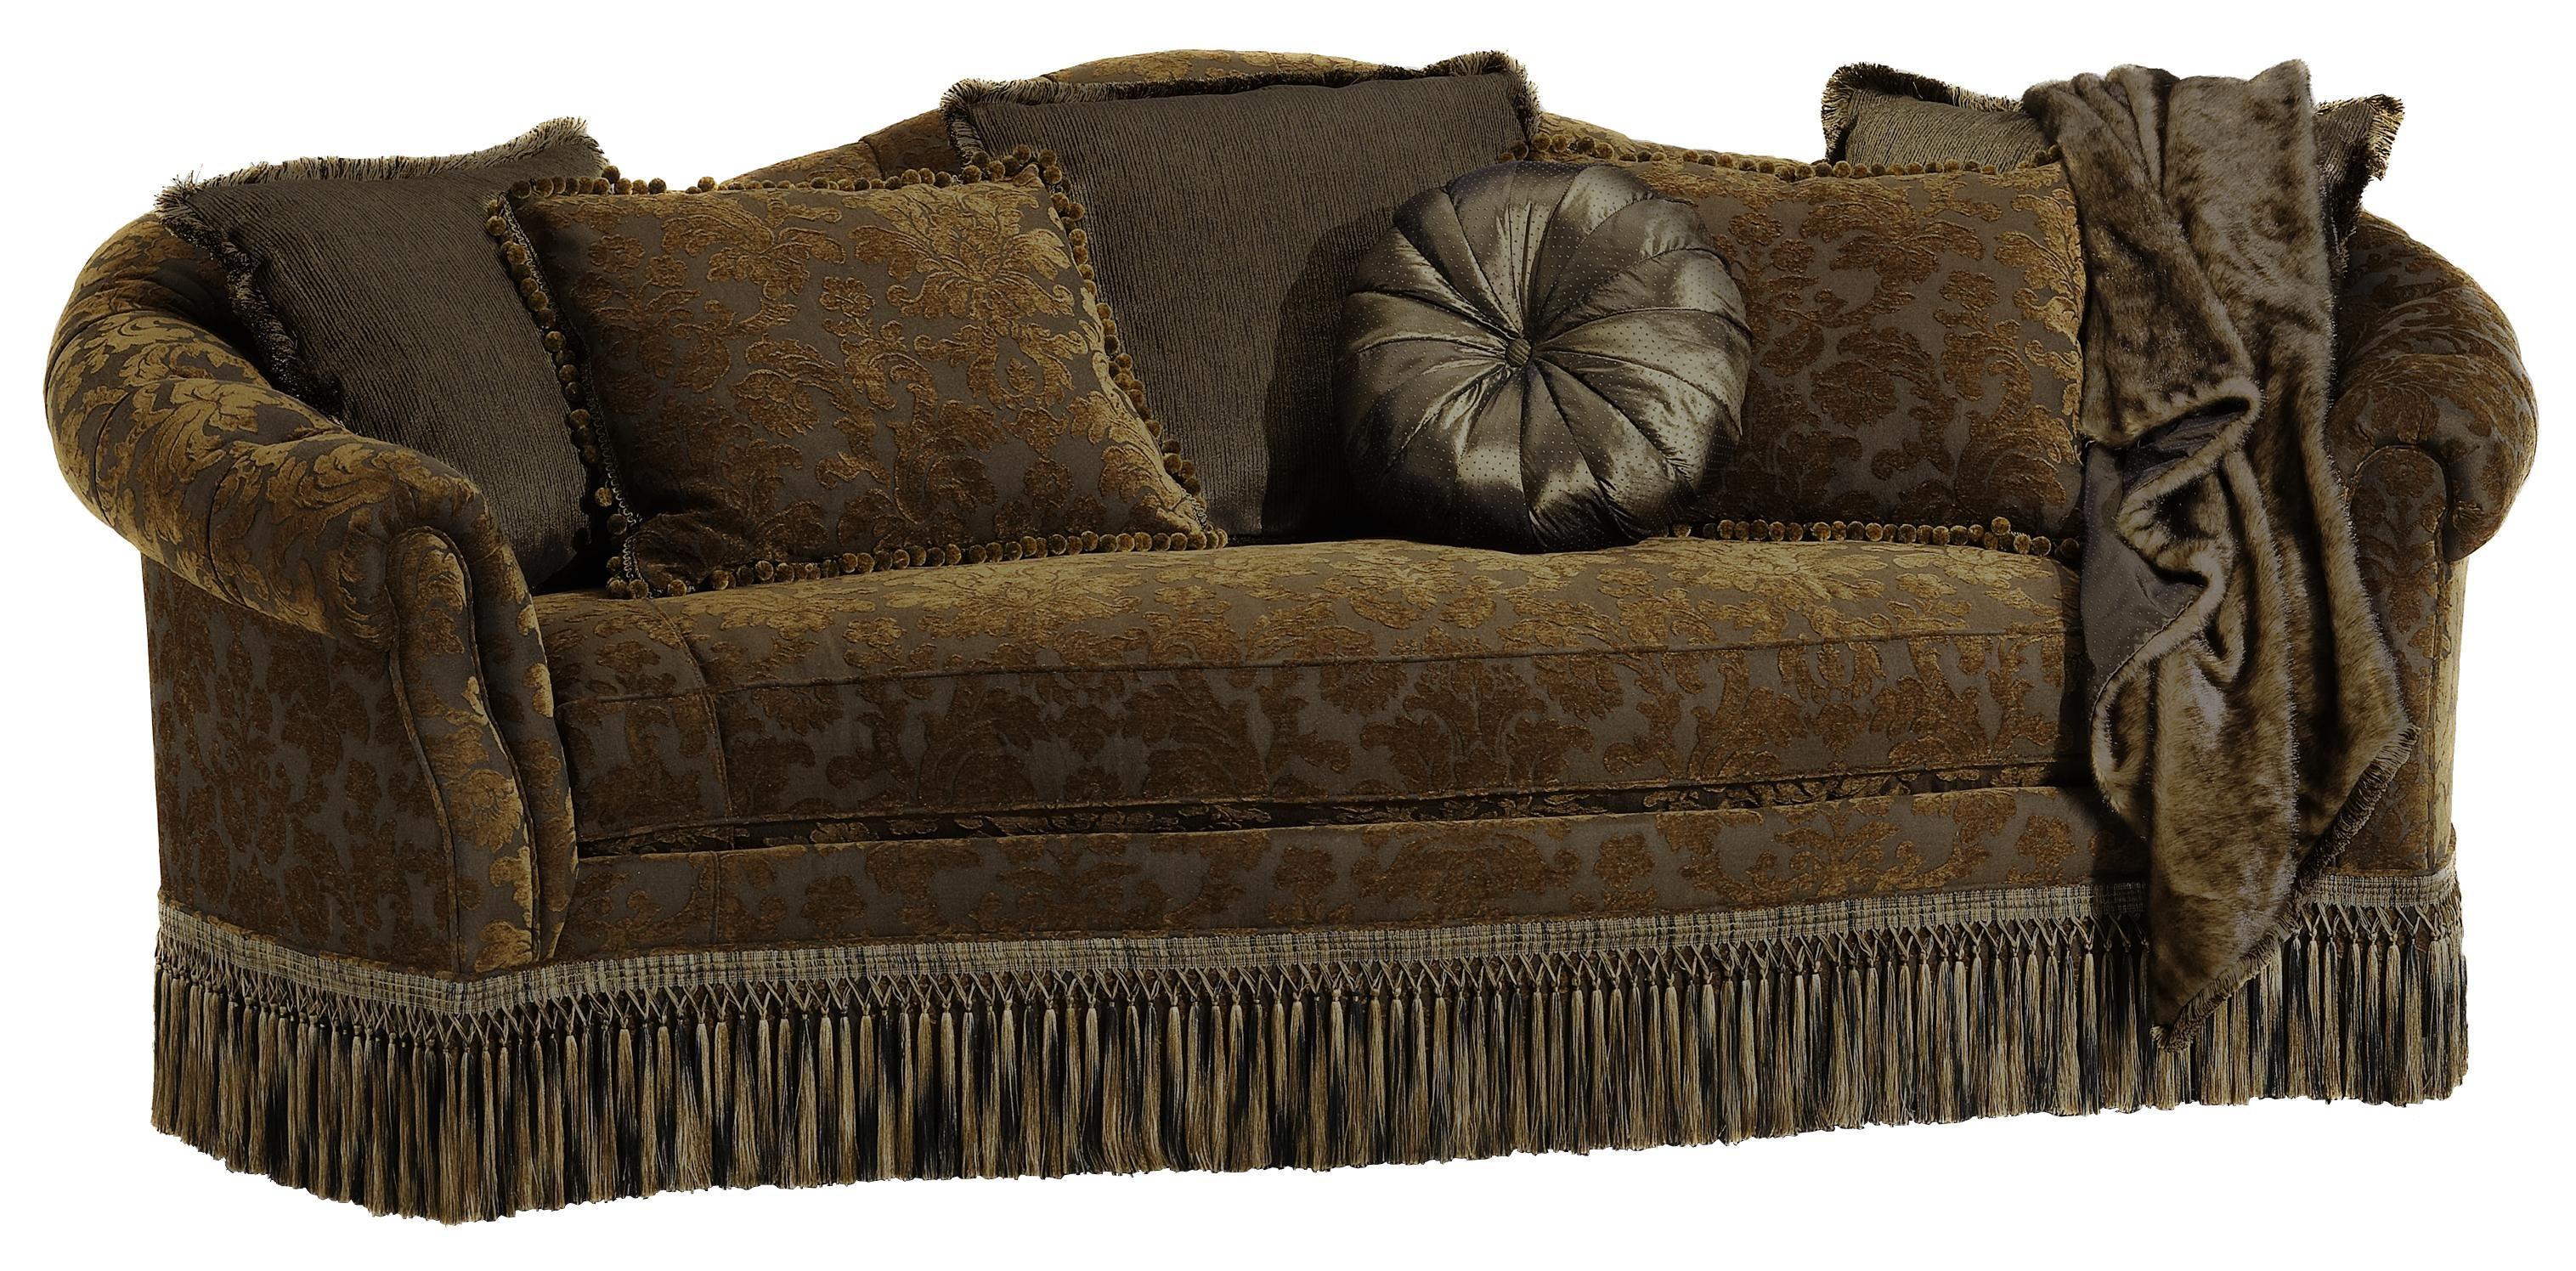 Shop For The Rachlin Classics Morgan Morgan Sofa At BigFurnitureWebsite    Your Furniture U0026 Mattress Store